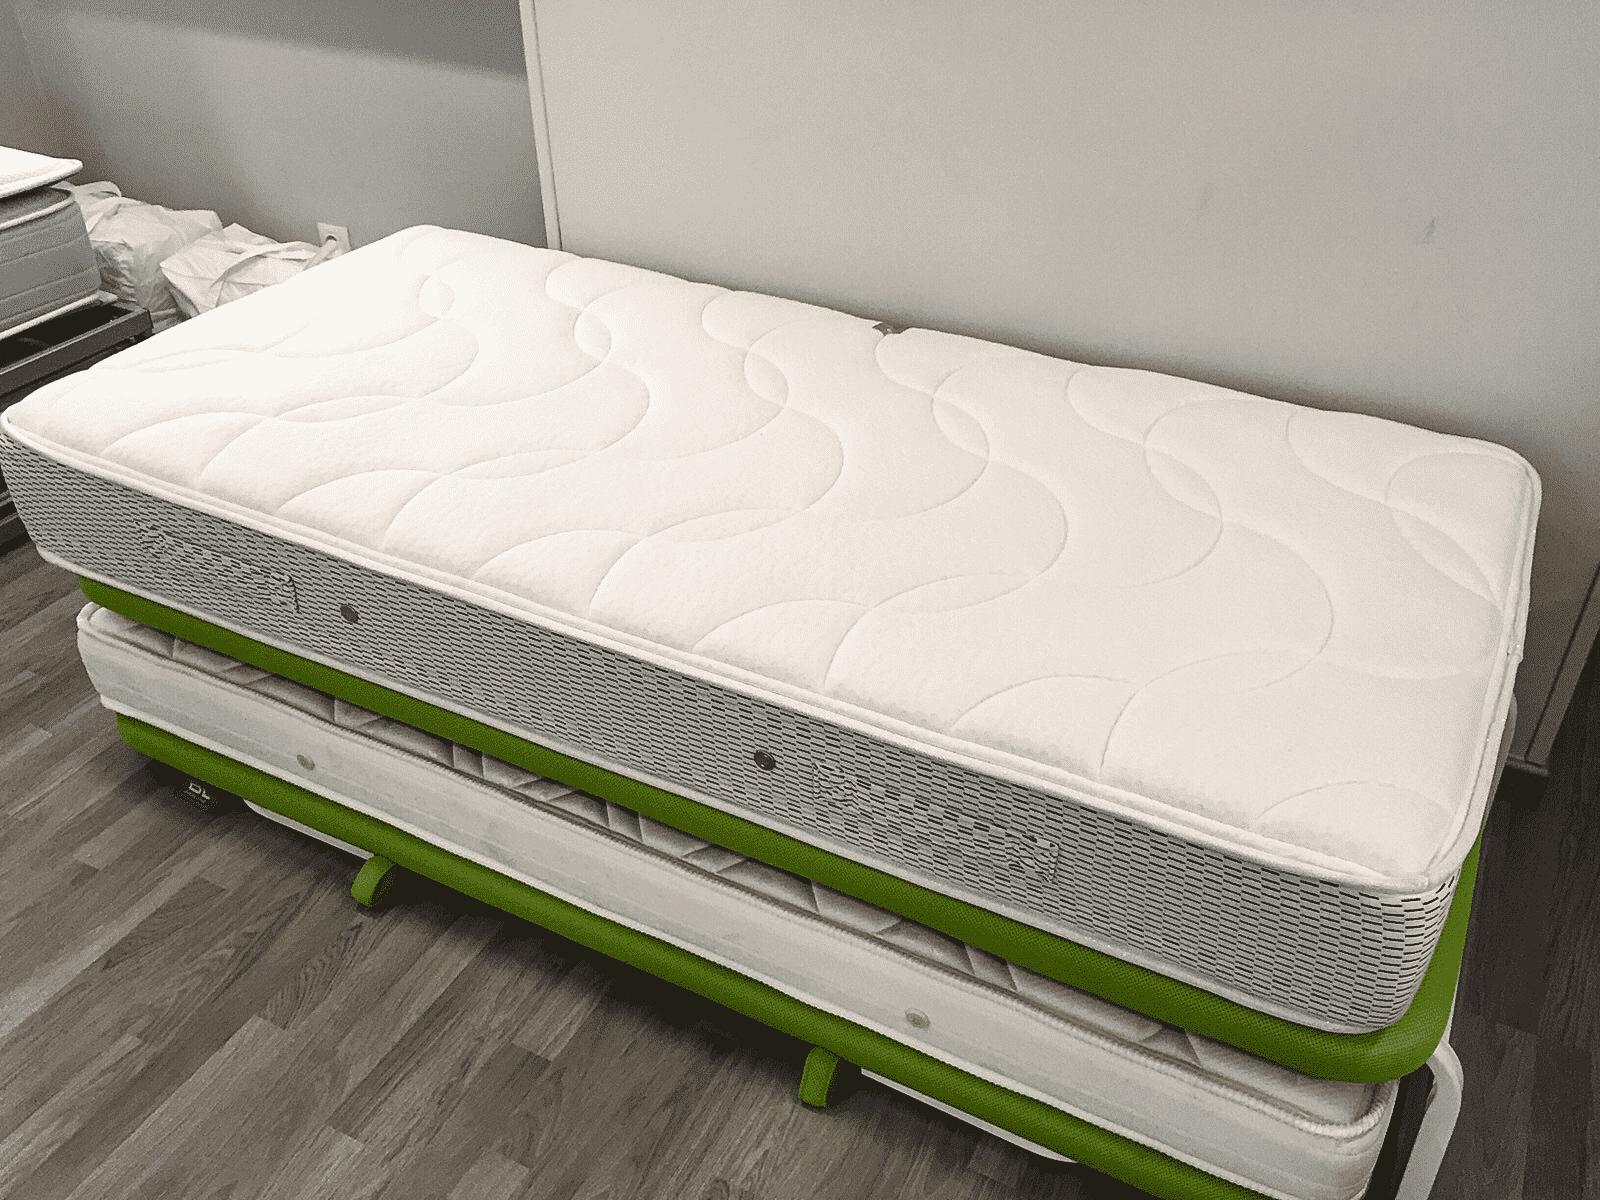 Litera triolo completa muebleslufe fabricar cama nido for Camas nido baratas